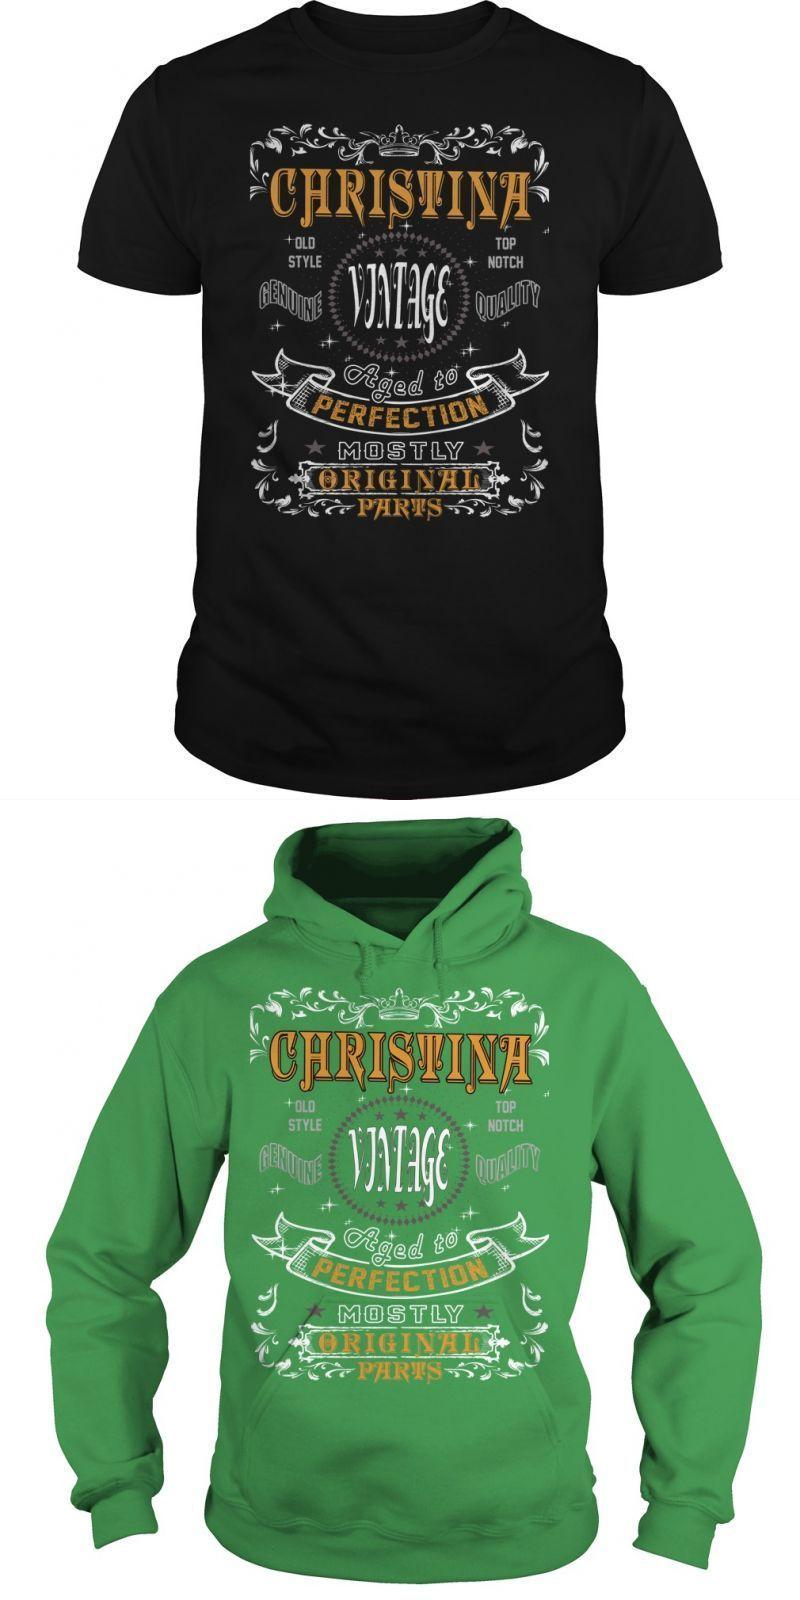 Christina Vintage Age To Perfection Christian T Shirt Ebay #christian #t #shirt #australia #christian #t #shirt #brands #christian #t #shirt #graphics #free #christian #t #shirt #uk